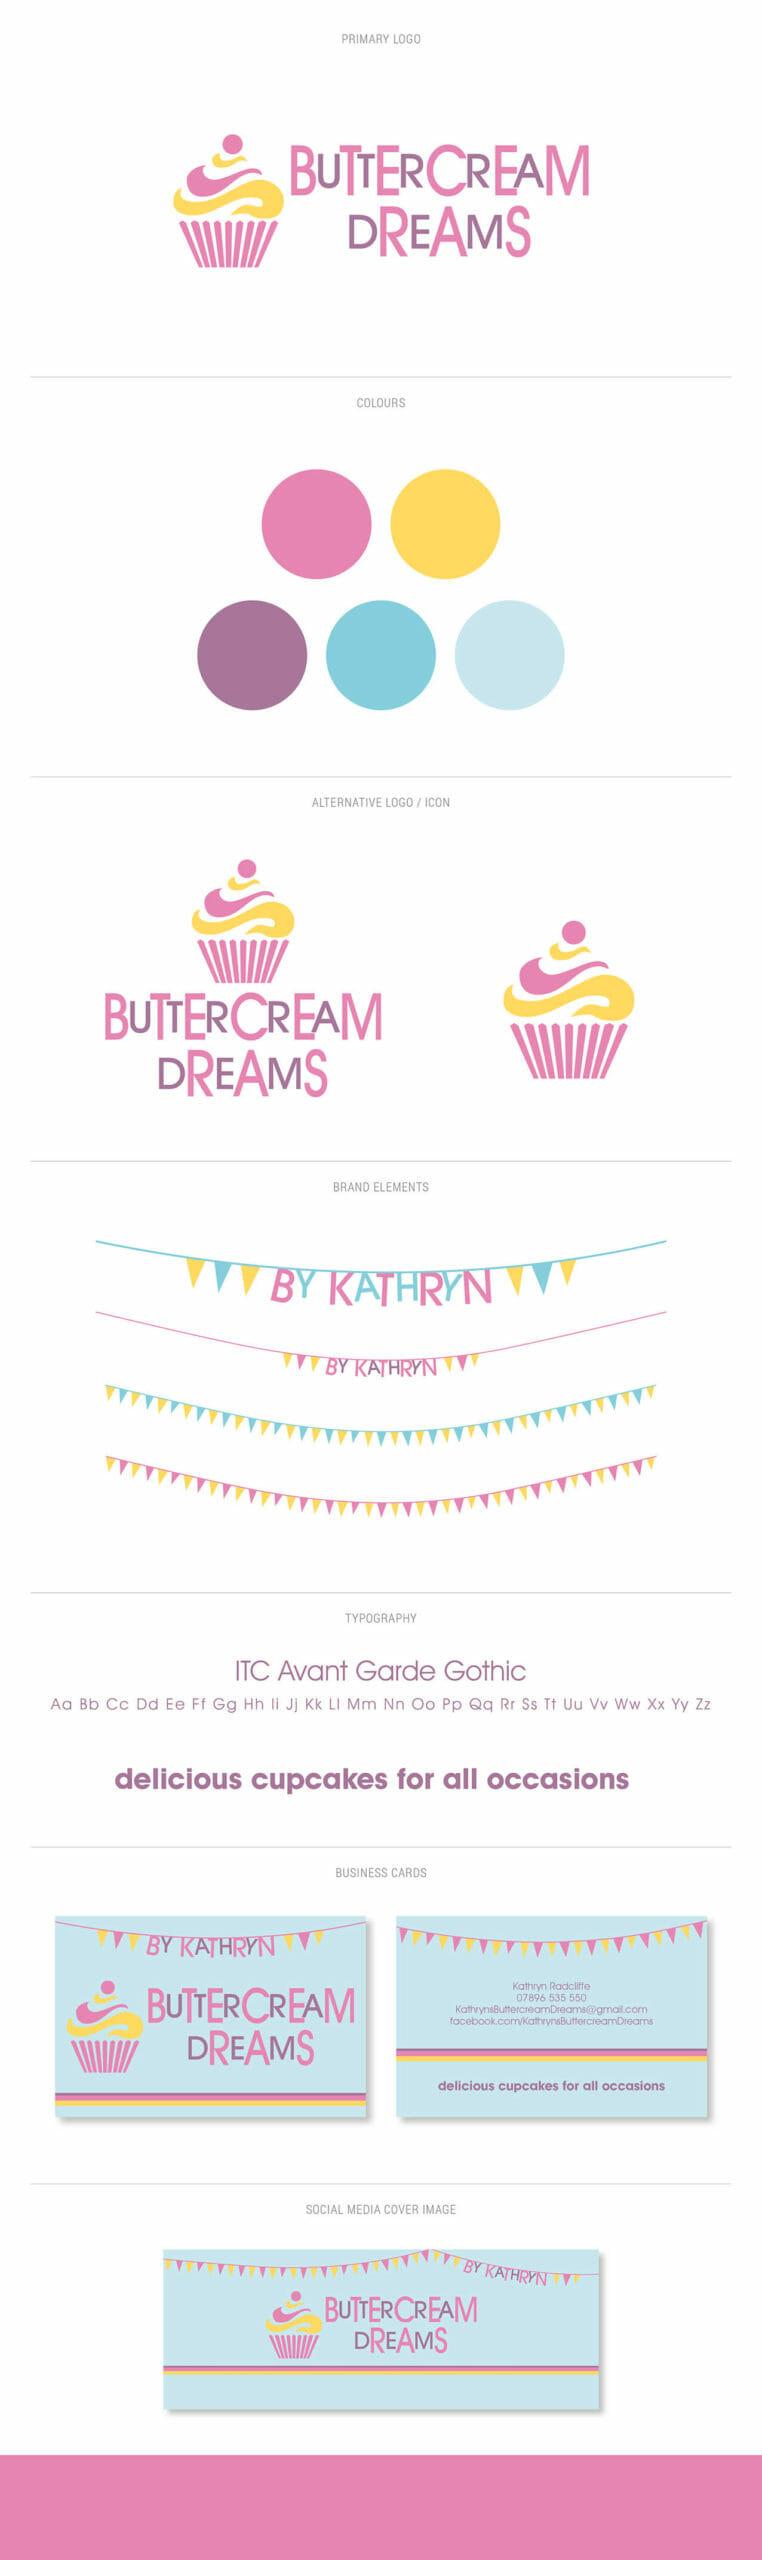 Buttercream Dreams branding identity